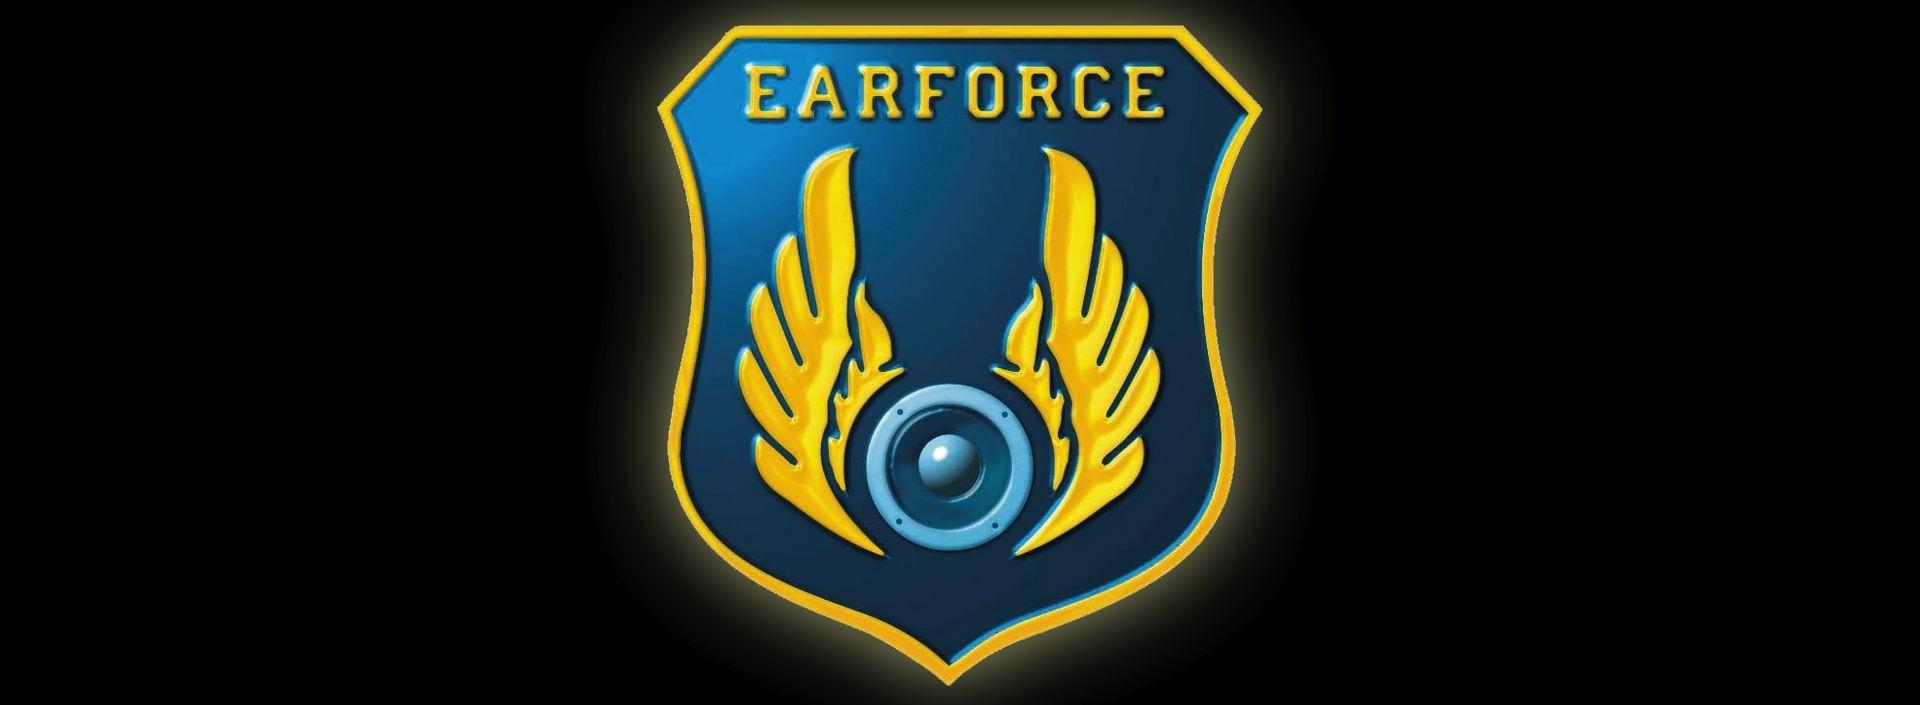 Earforcelogoblack_1